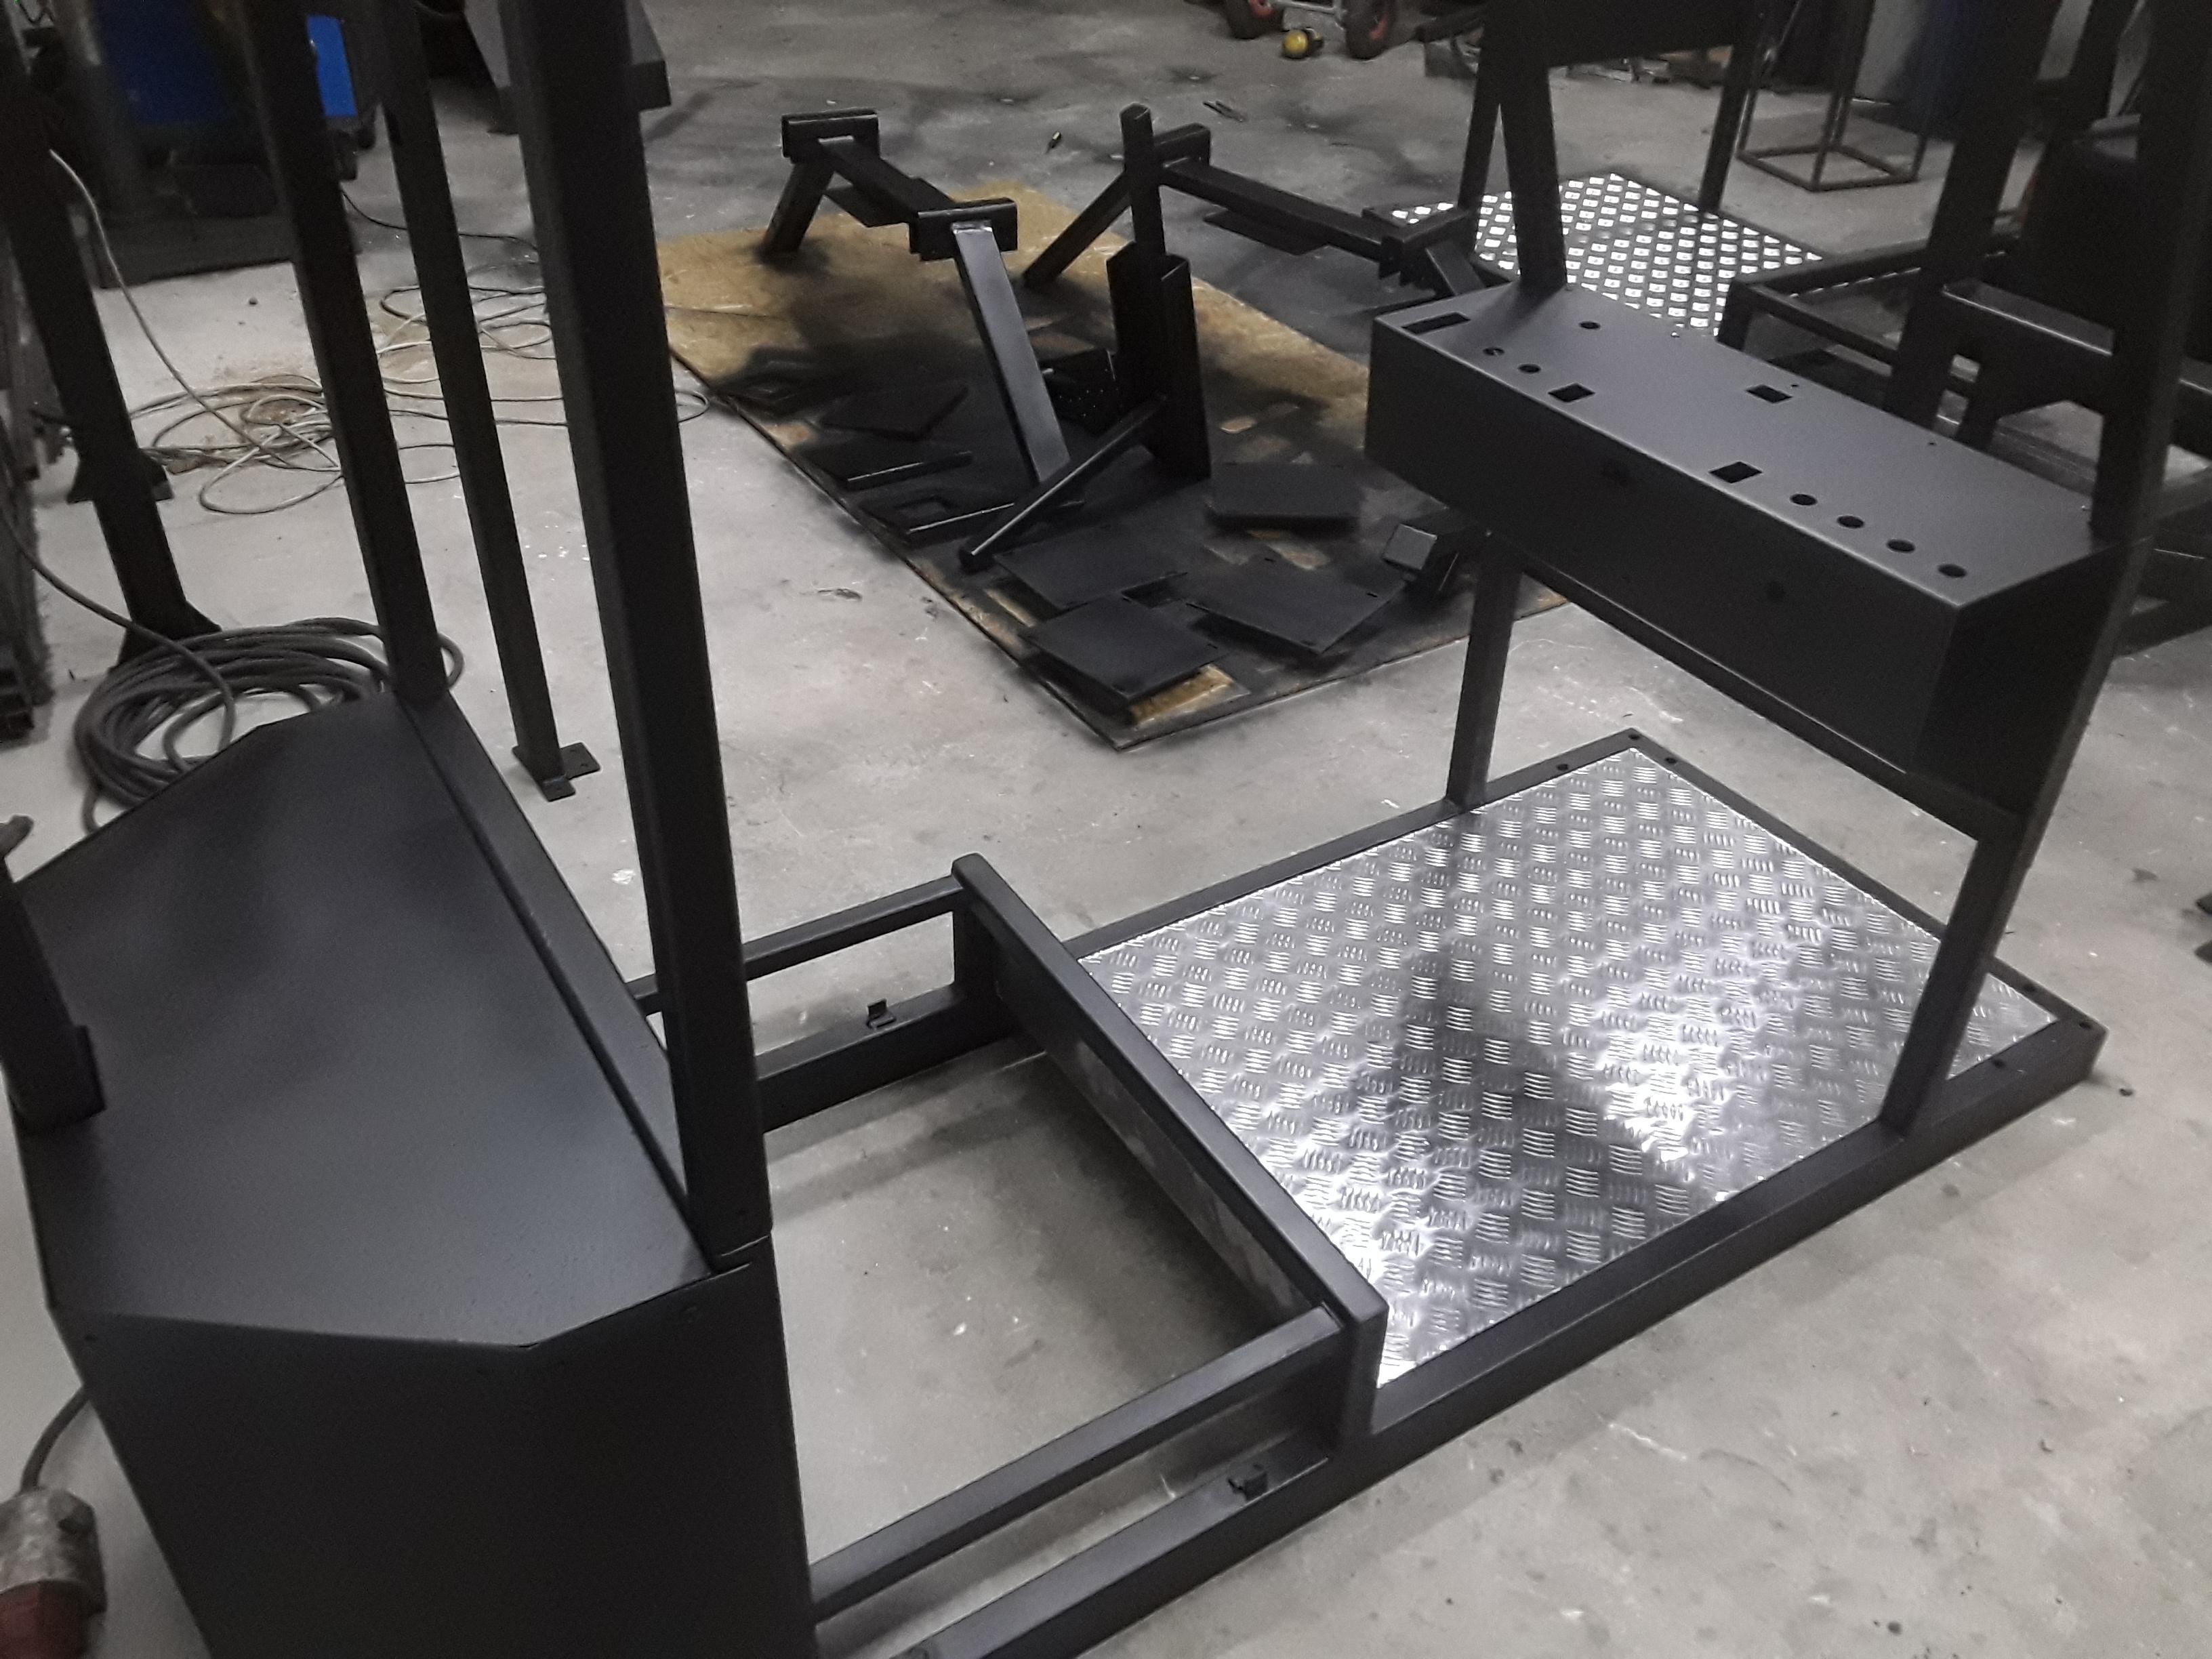 konstrukcje pod symulatory dla wojska